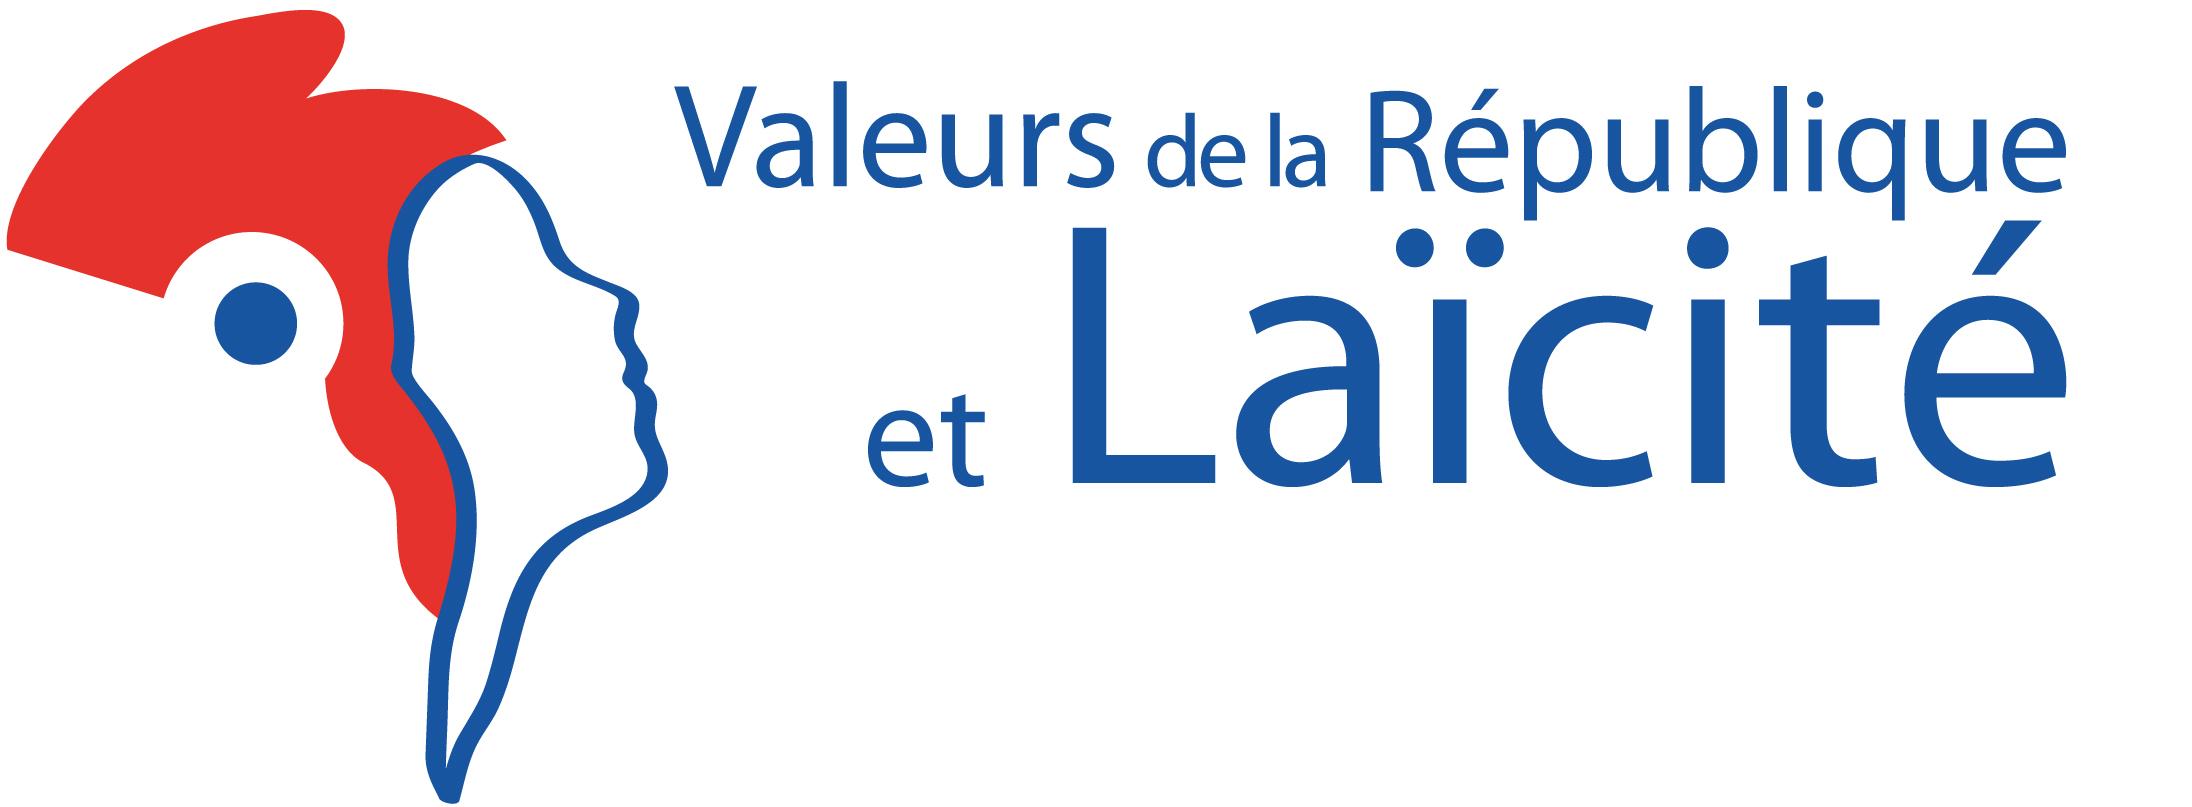 LOGO VAL REP Marianne 3 S RGE.jpg